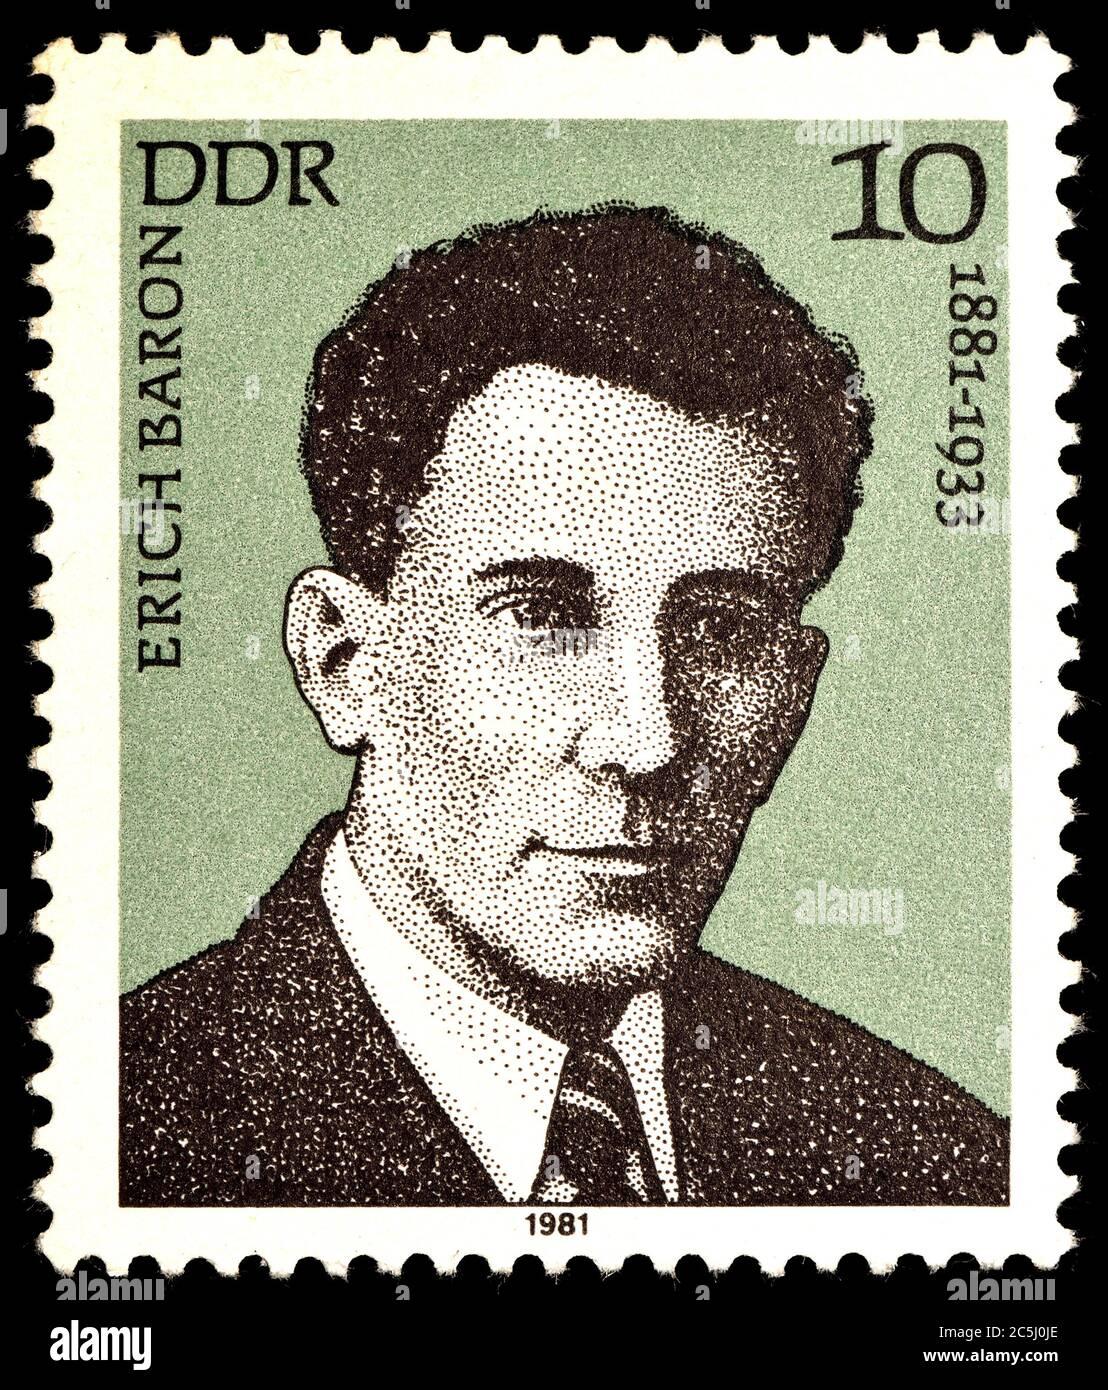 Francobollo tedesco orientale (1981) : Erich Baron (1881 - 1933 ) avvocato, giornalista e antifascista tedesco Foto Stock